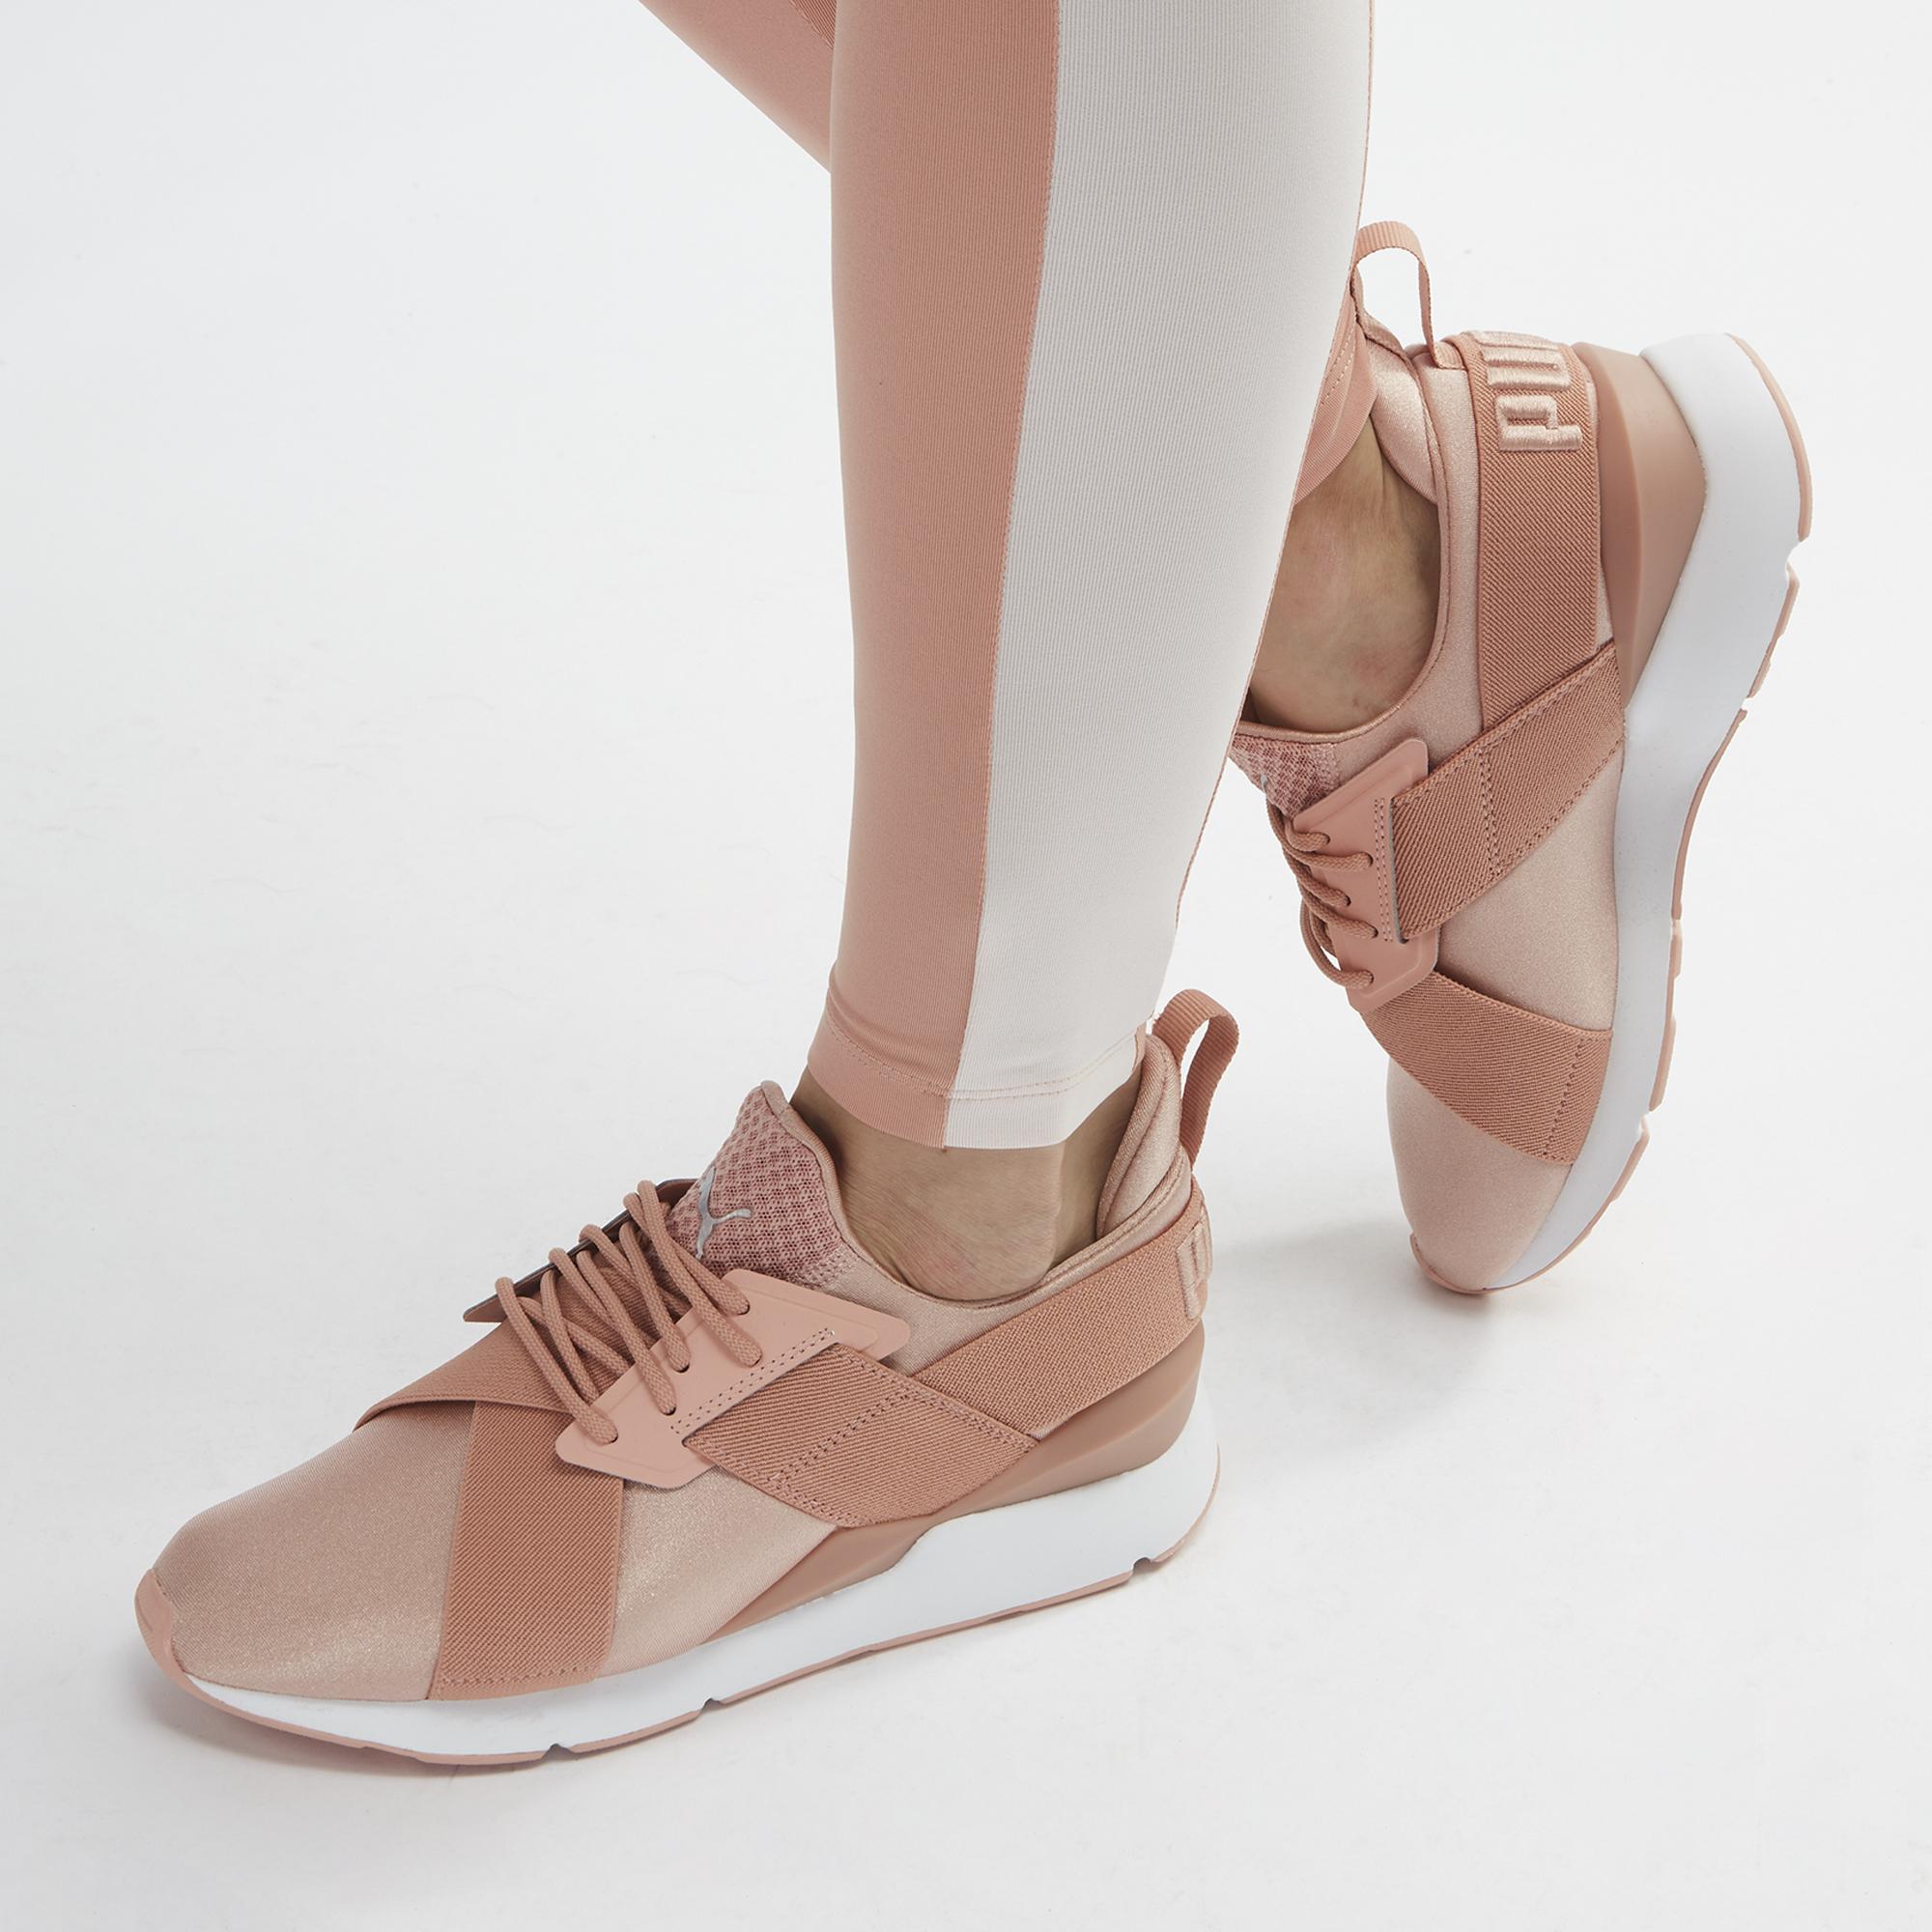 Shop Pink PUMA En Pointe Muse Satin Training Shoe for Womens